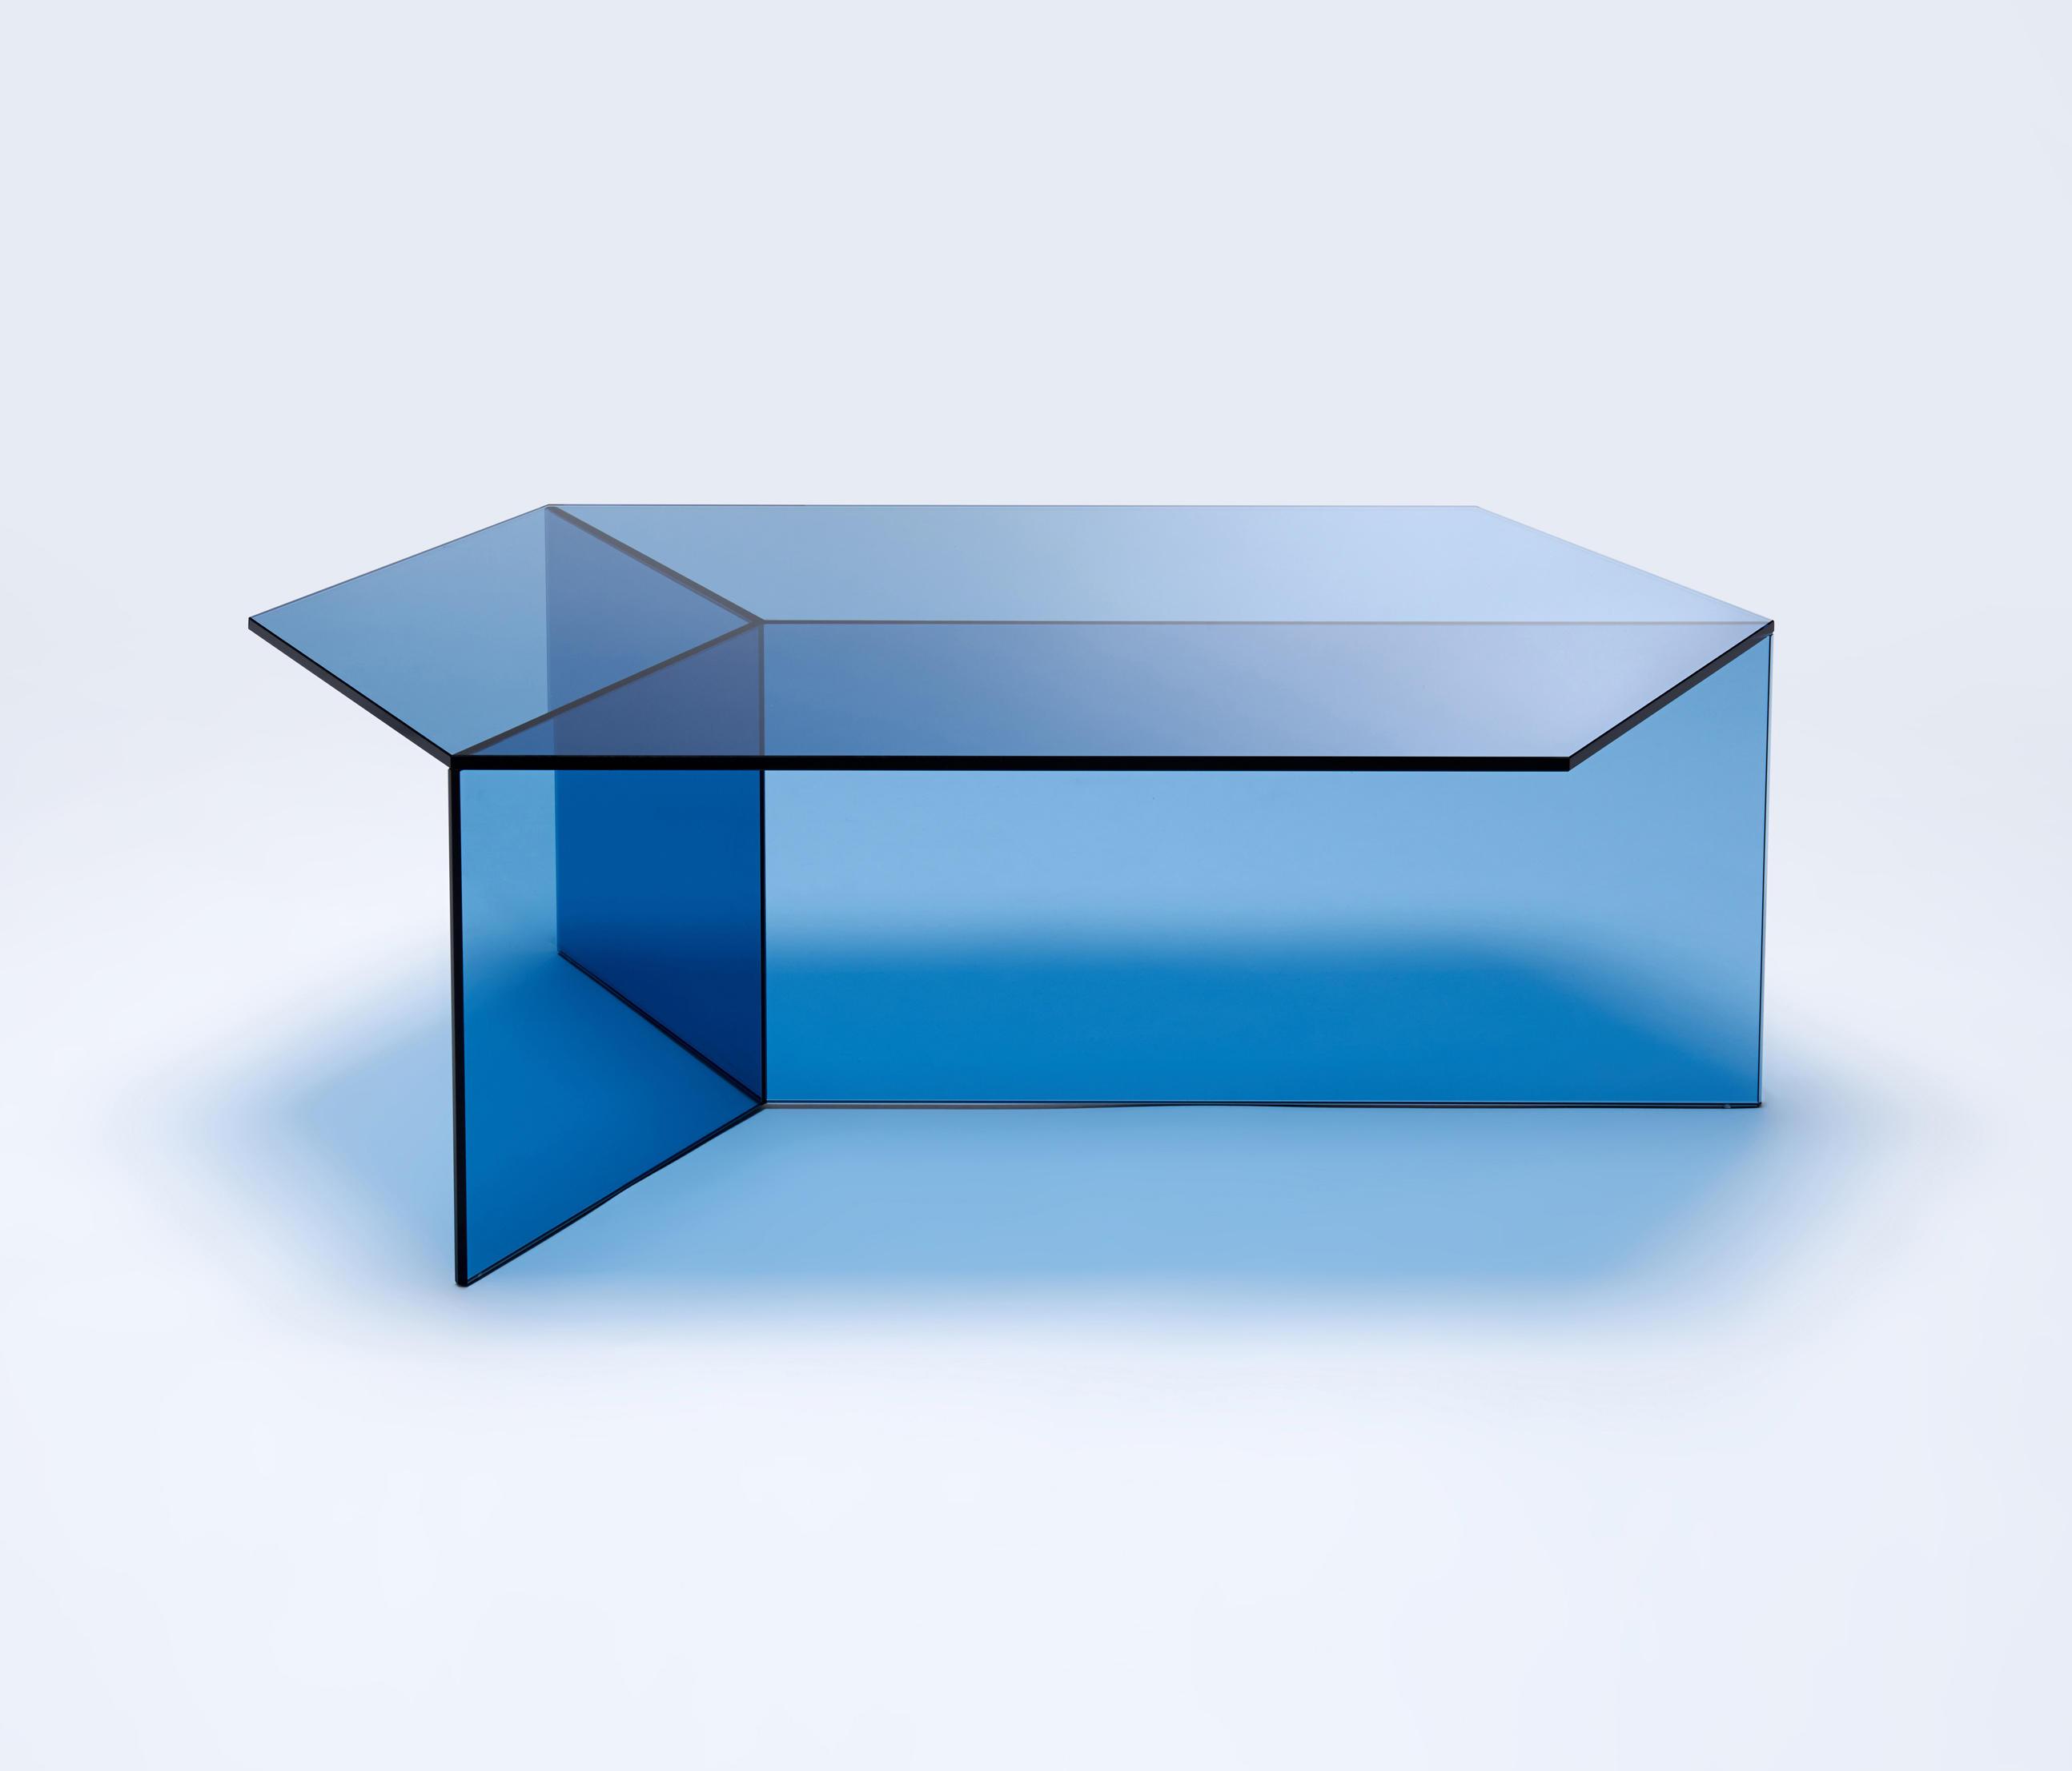 Isom Oblong Blue Designer Furniture Architonic